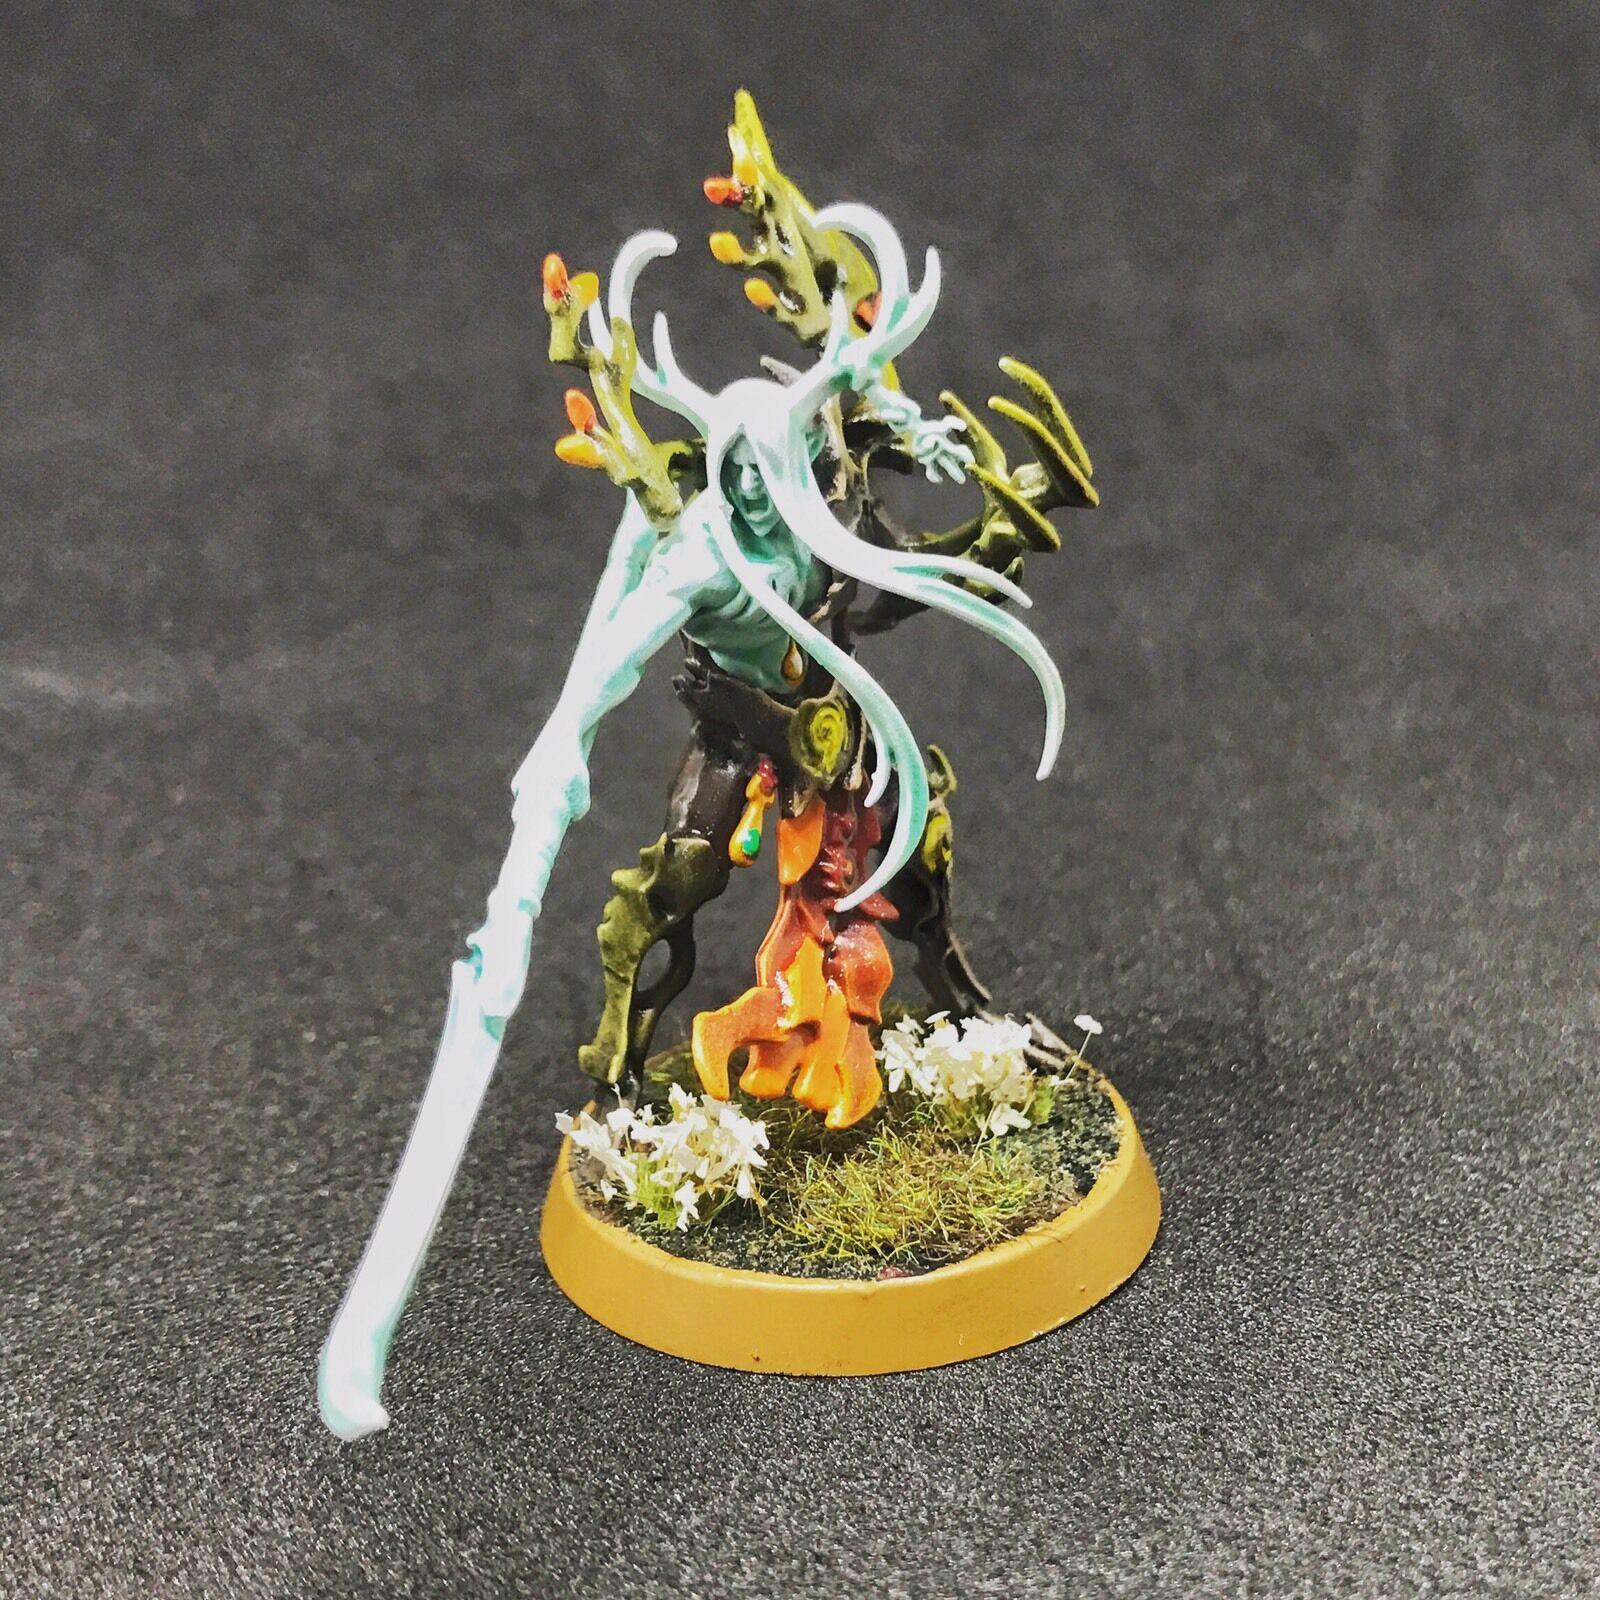 Tree-Revenants X 5-sylvaneth-Pro Pintado A Pedido